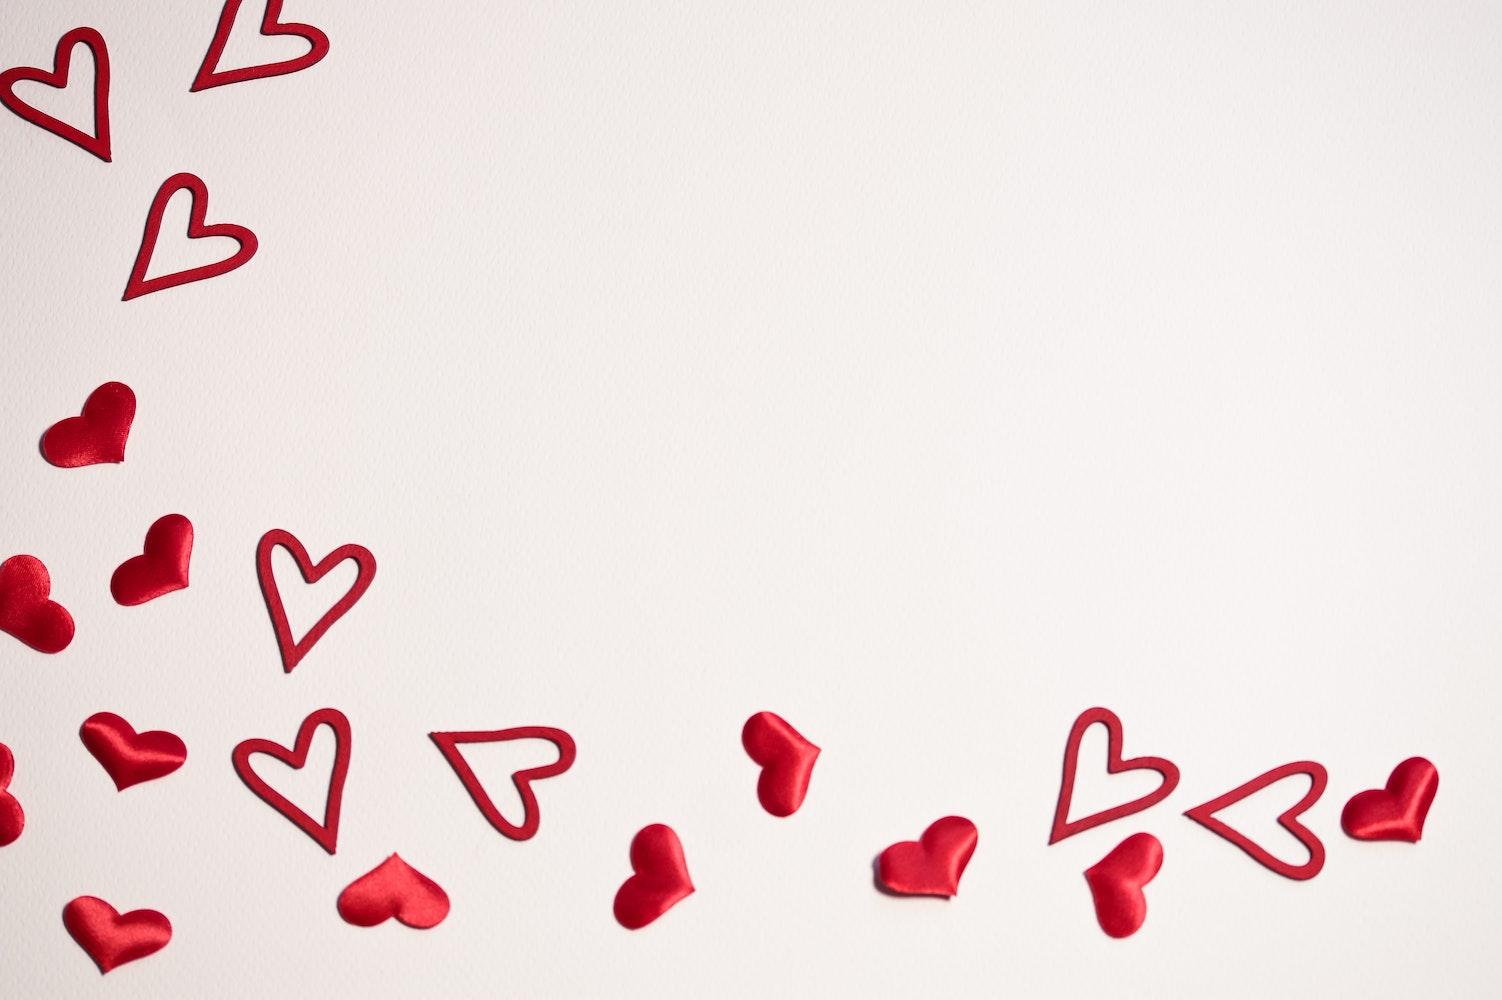 500 Beautiful Valentine S Day Photos Pexels Free Stock Photos